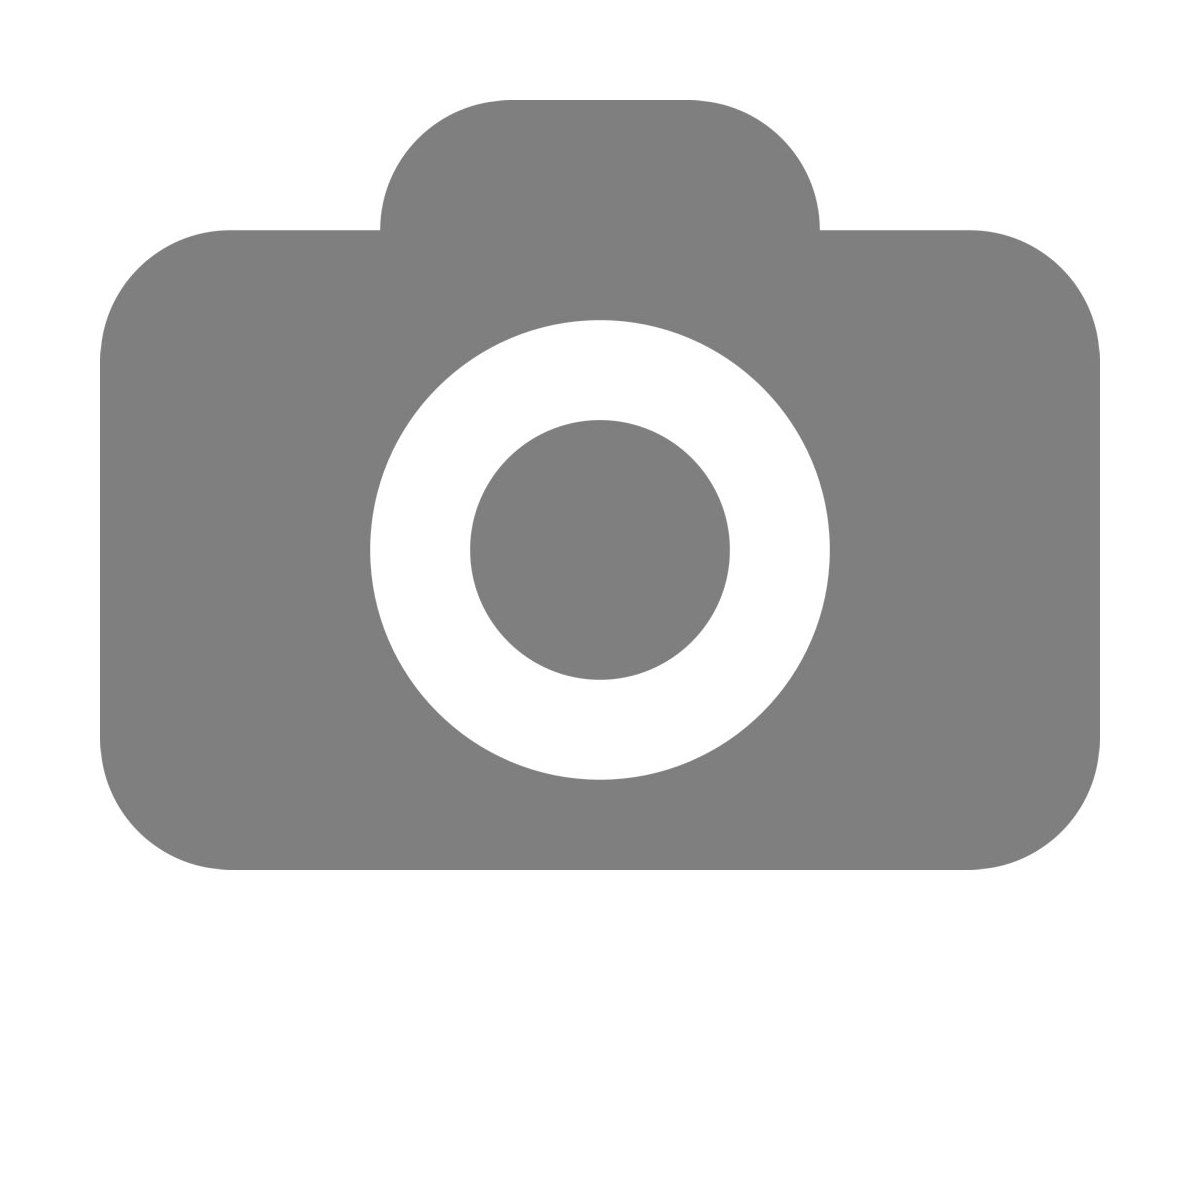 supercharger softshell 2 0 cja201102 cast iron jas 999